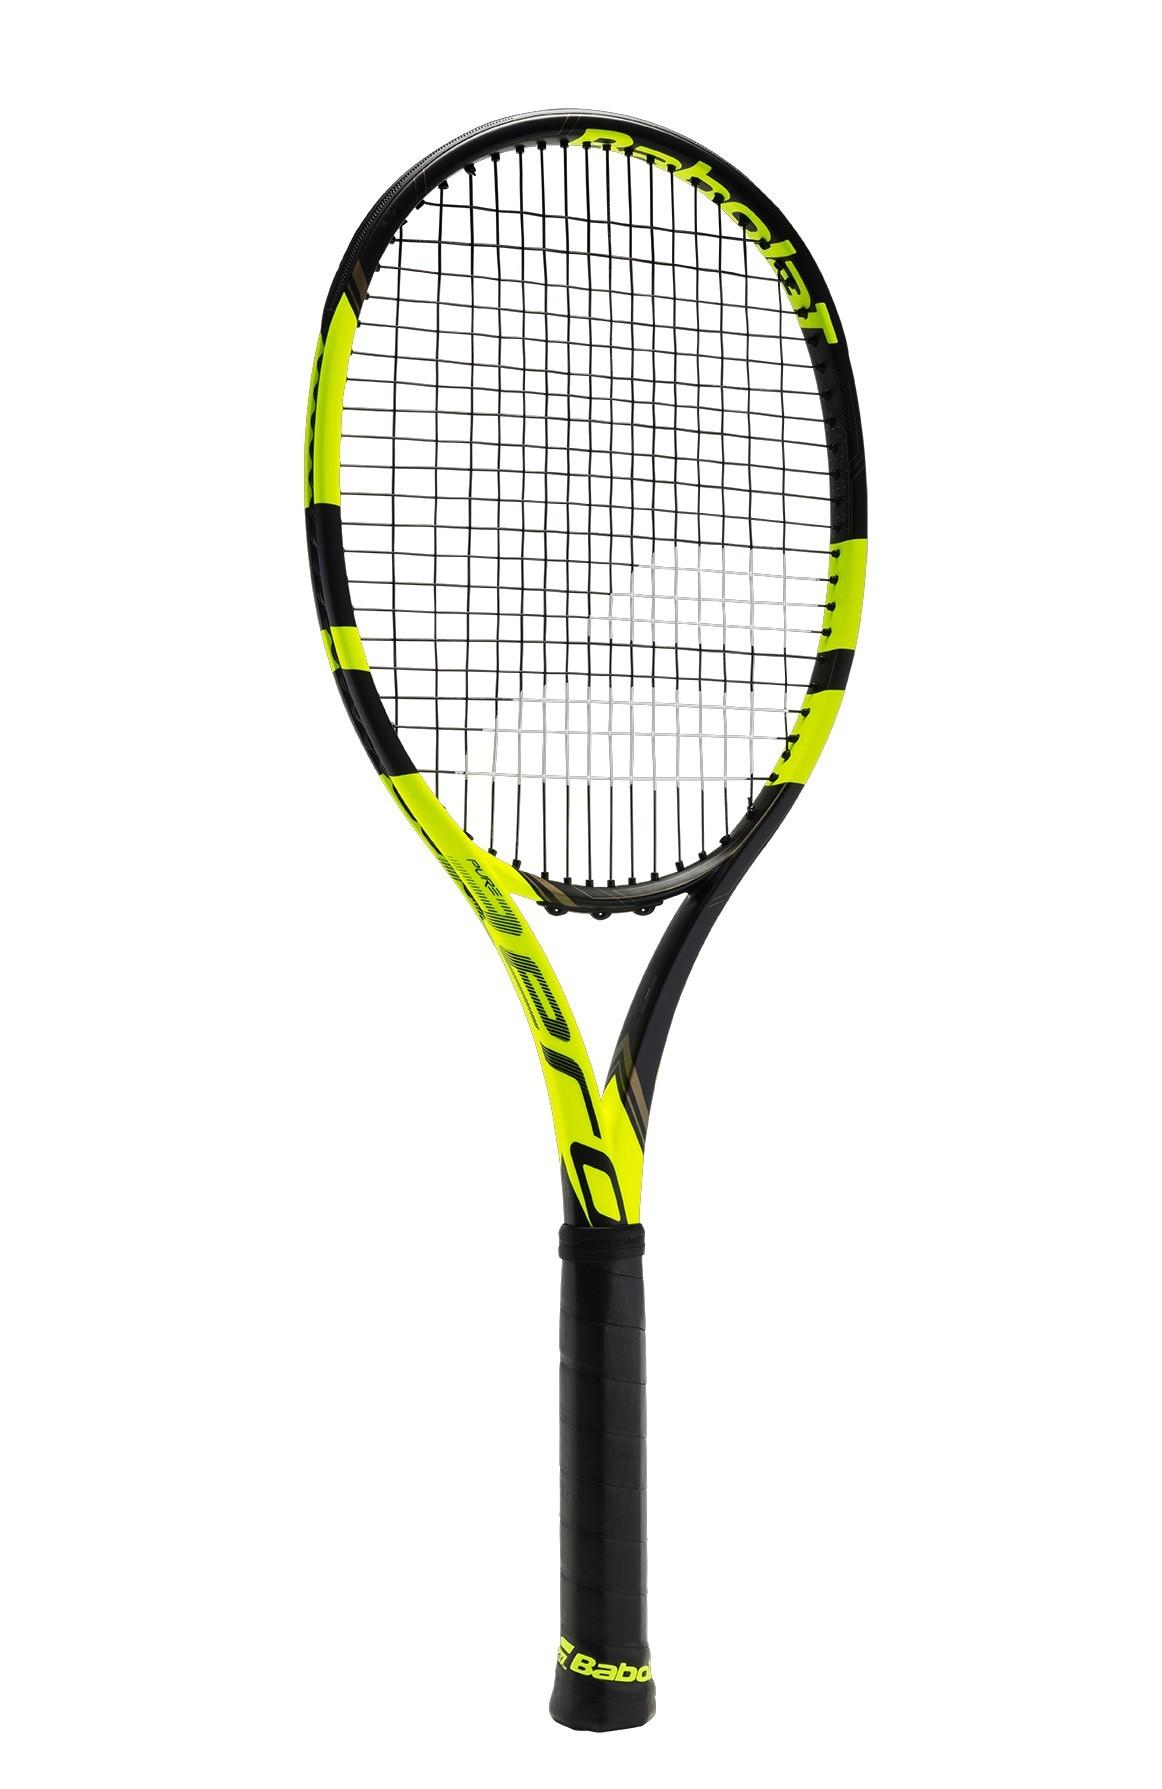 Rakieta tenisowa Babolat Pure Aero VS Tour - wyprzedaż!